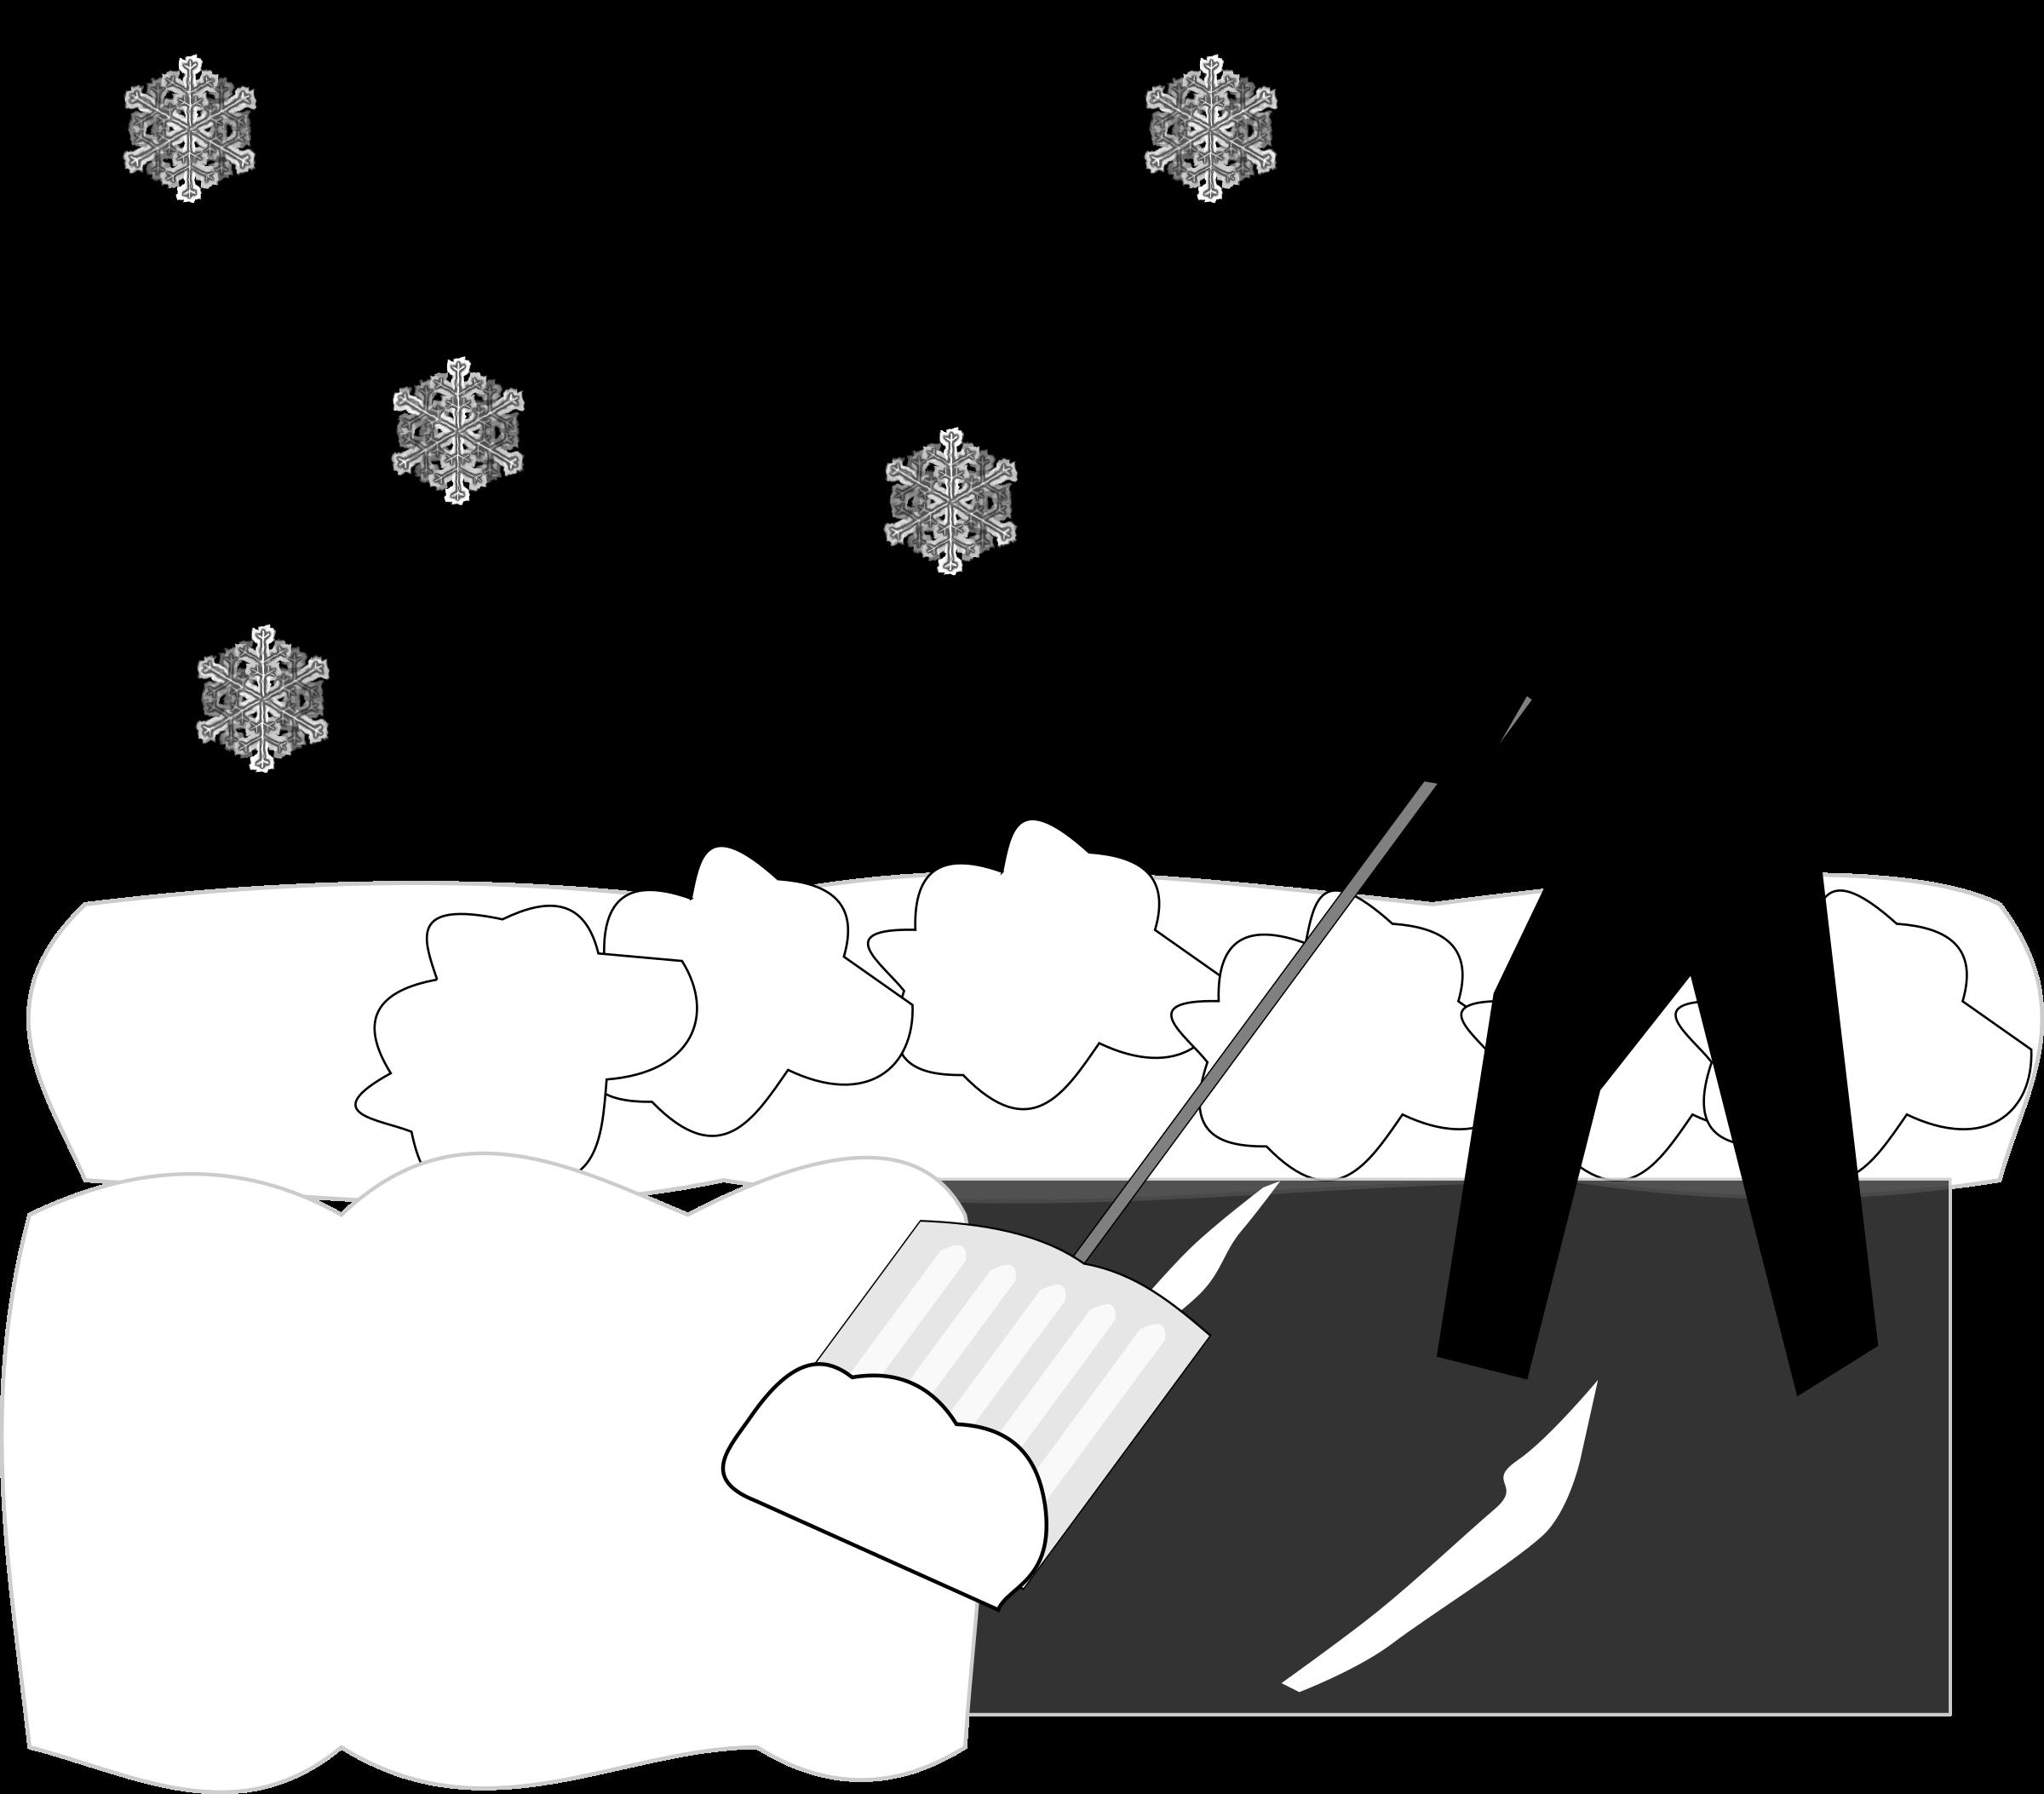 shoveling snow clipart free - photo #33